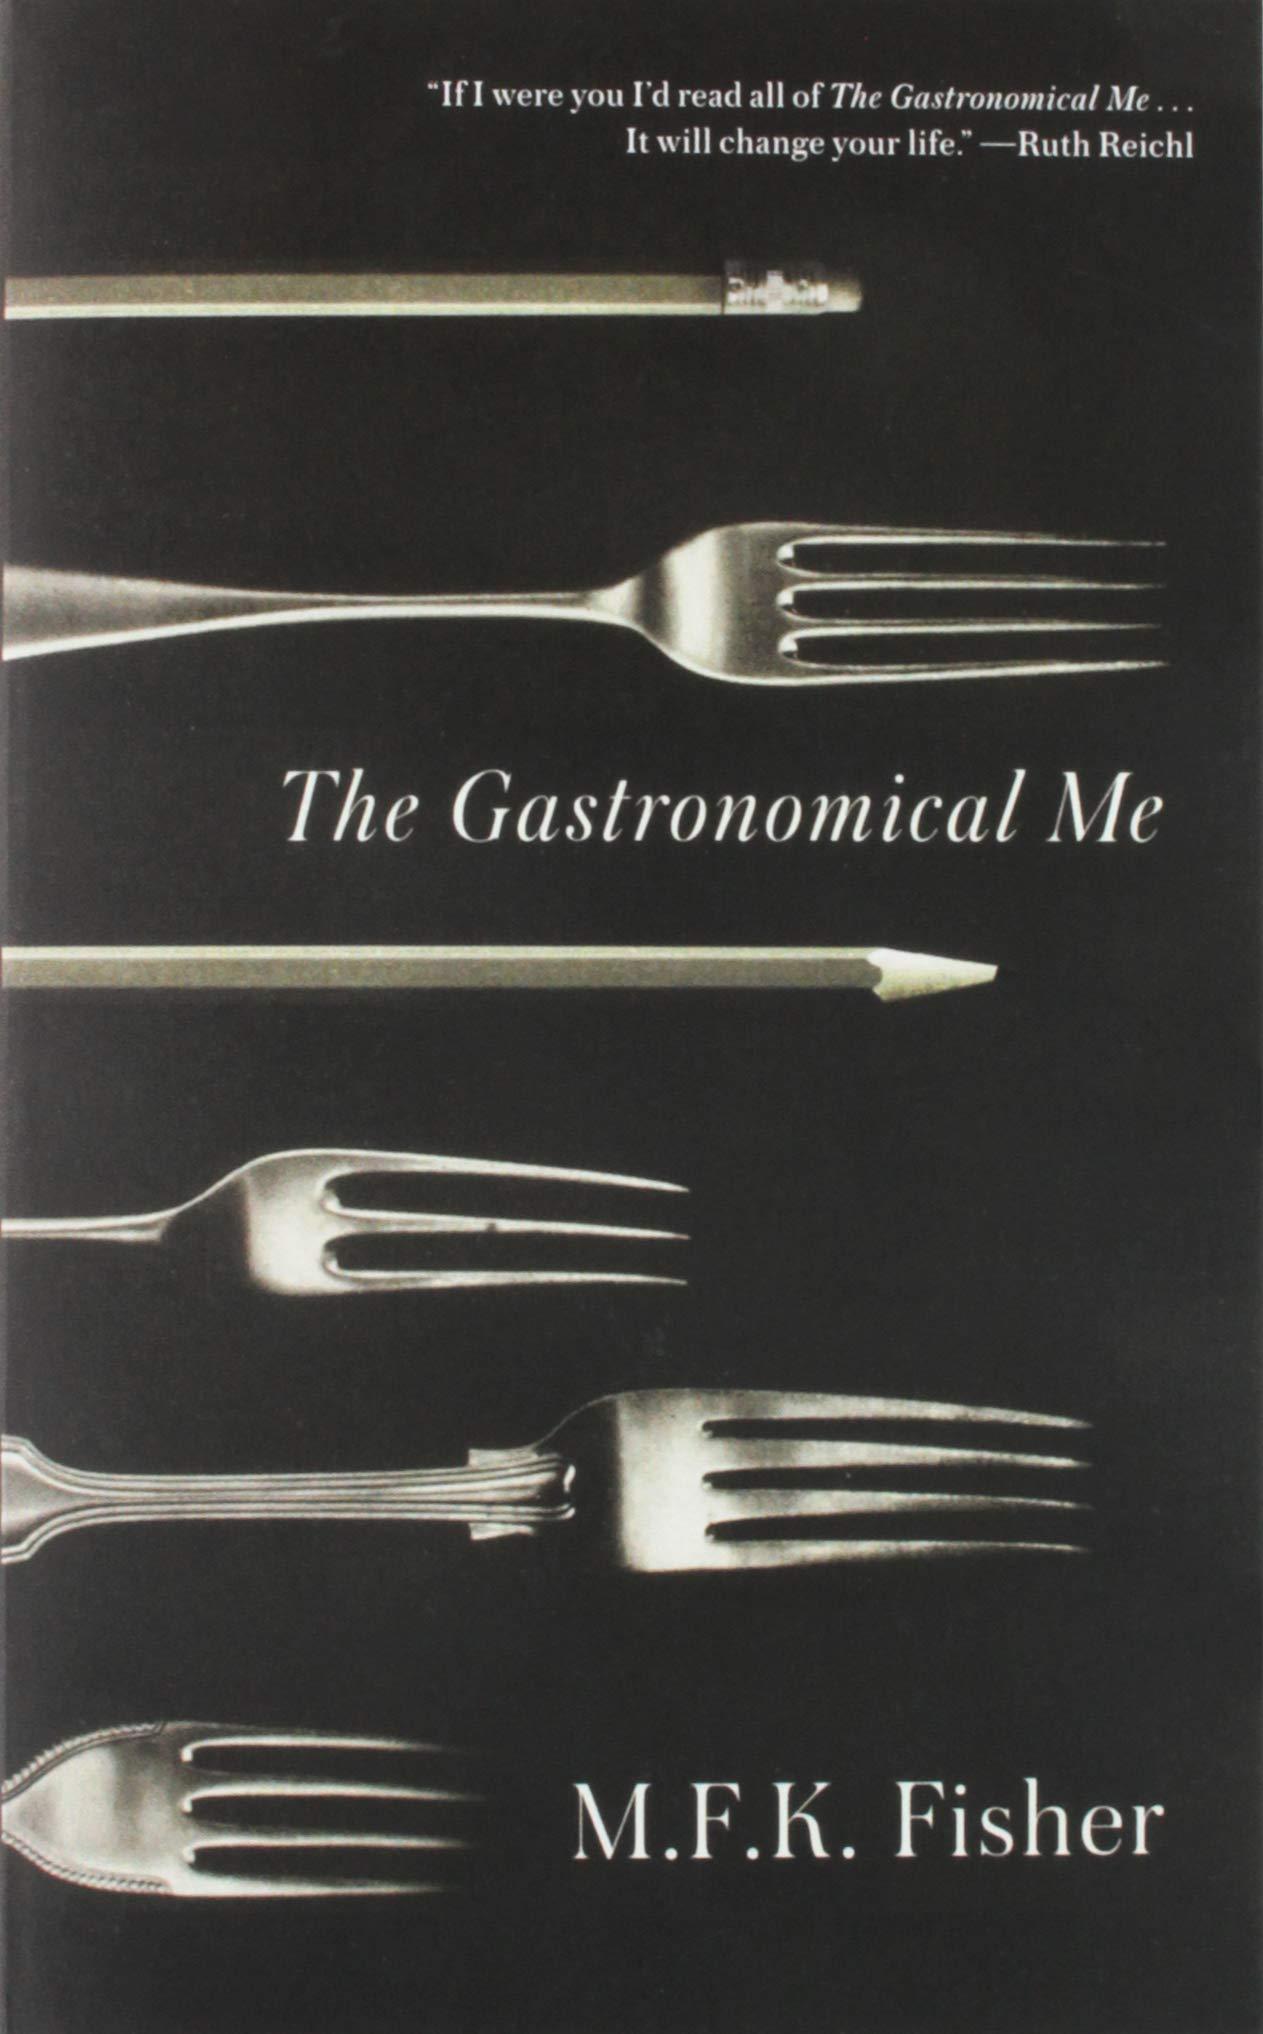 The Gastronomical Me: M. F. K. Fisher: 9780865473928: Amazon.com: Books